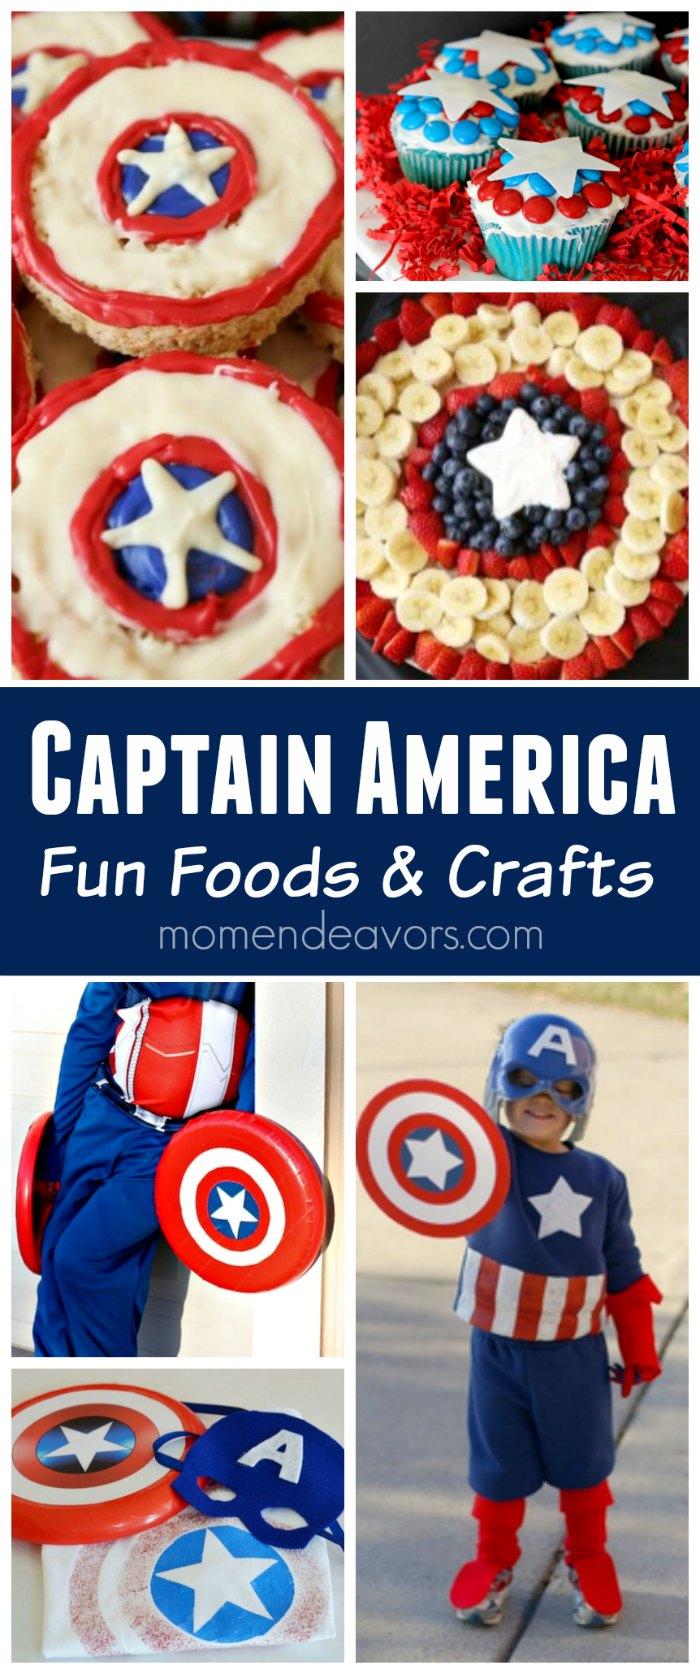 captain-america-fun-food-crafts